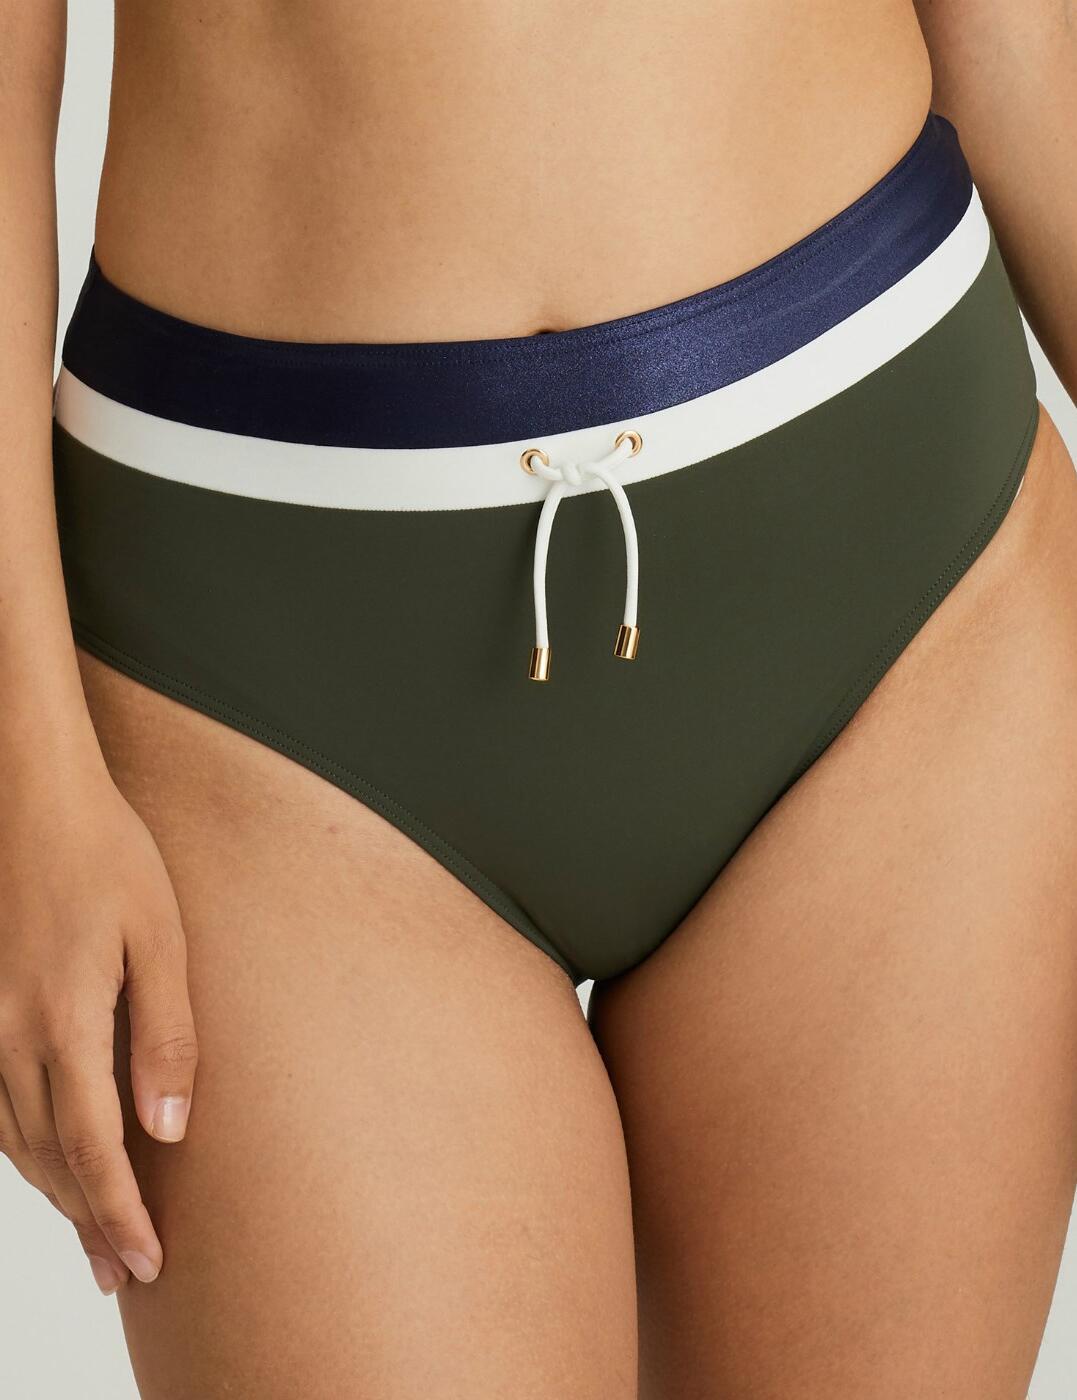 4002051 Prima Donna Ocean Drive Full Bikini Brief - 4002051 Dark Olive